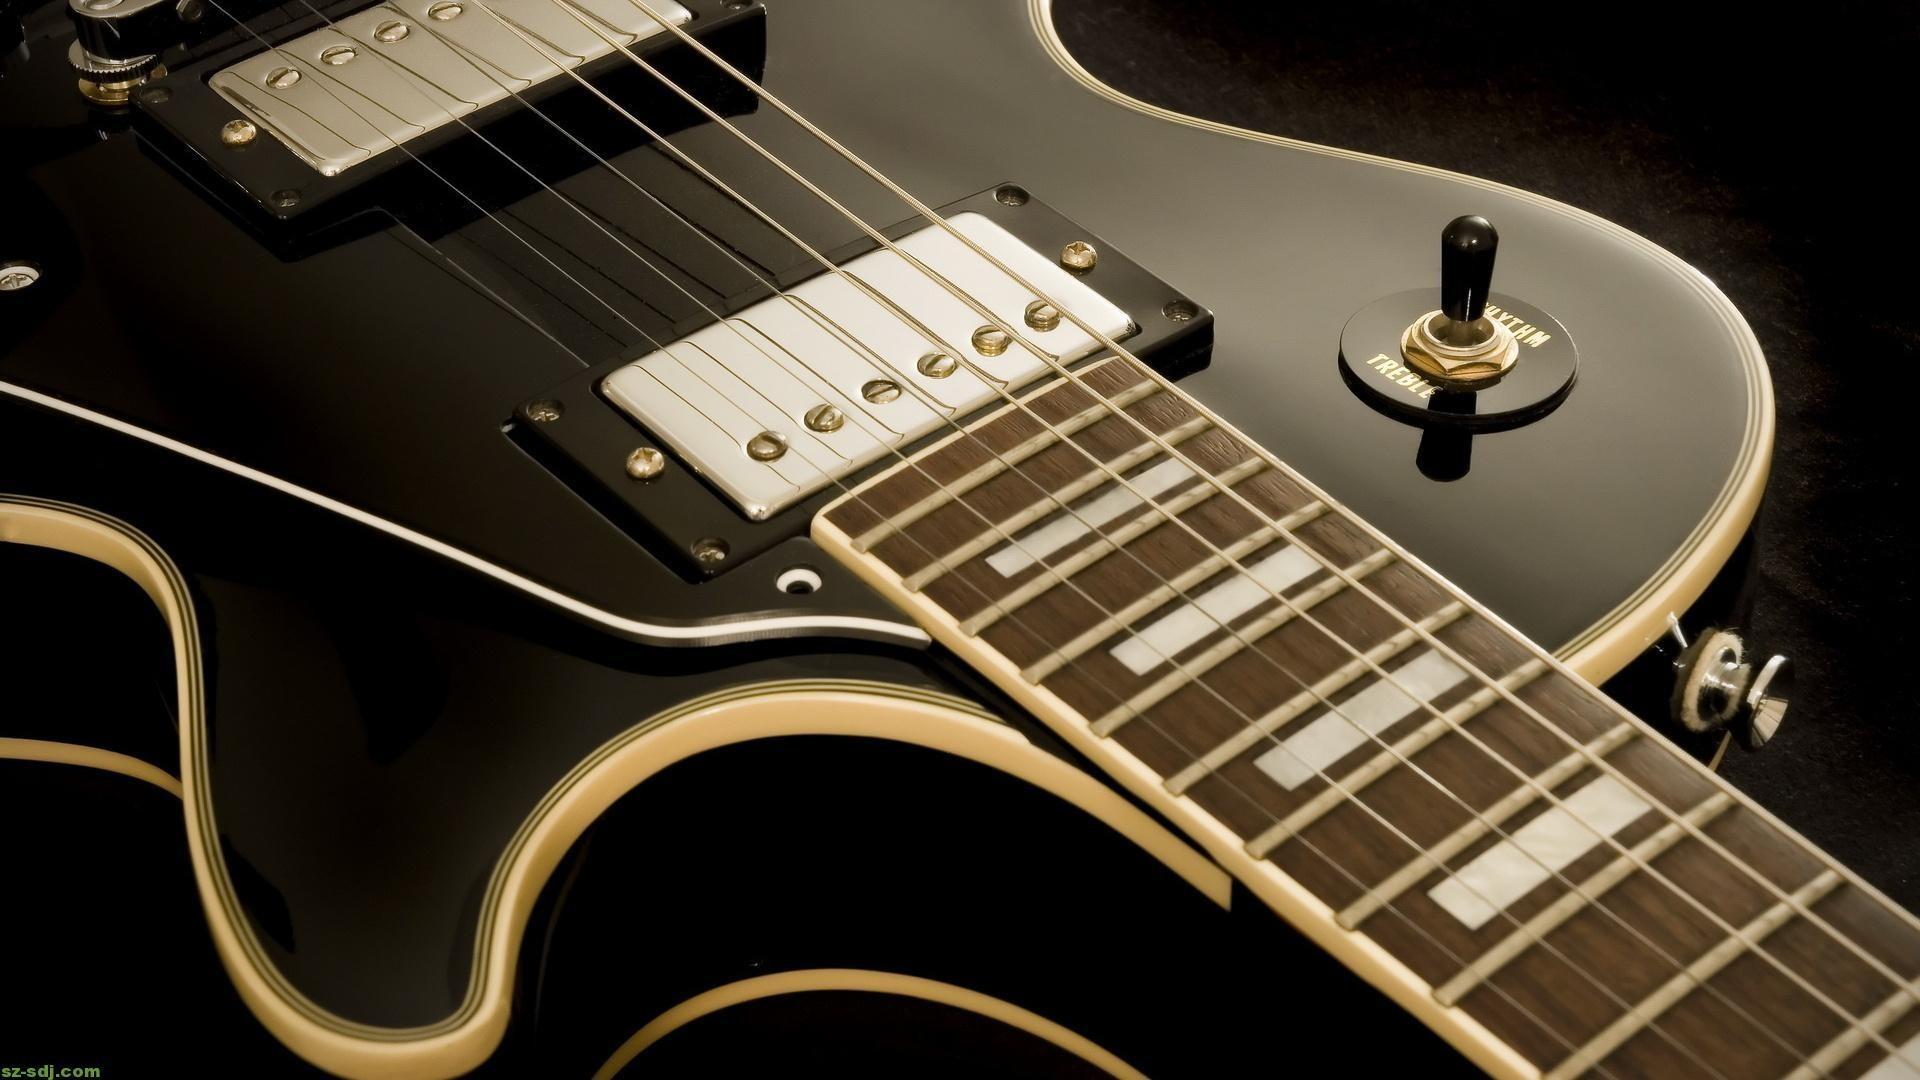 Res: 1920x1080,  Fender guitar wallpaper hd - Fender guitars backgrounds - Fender .